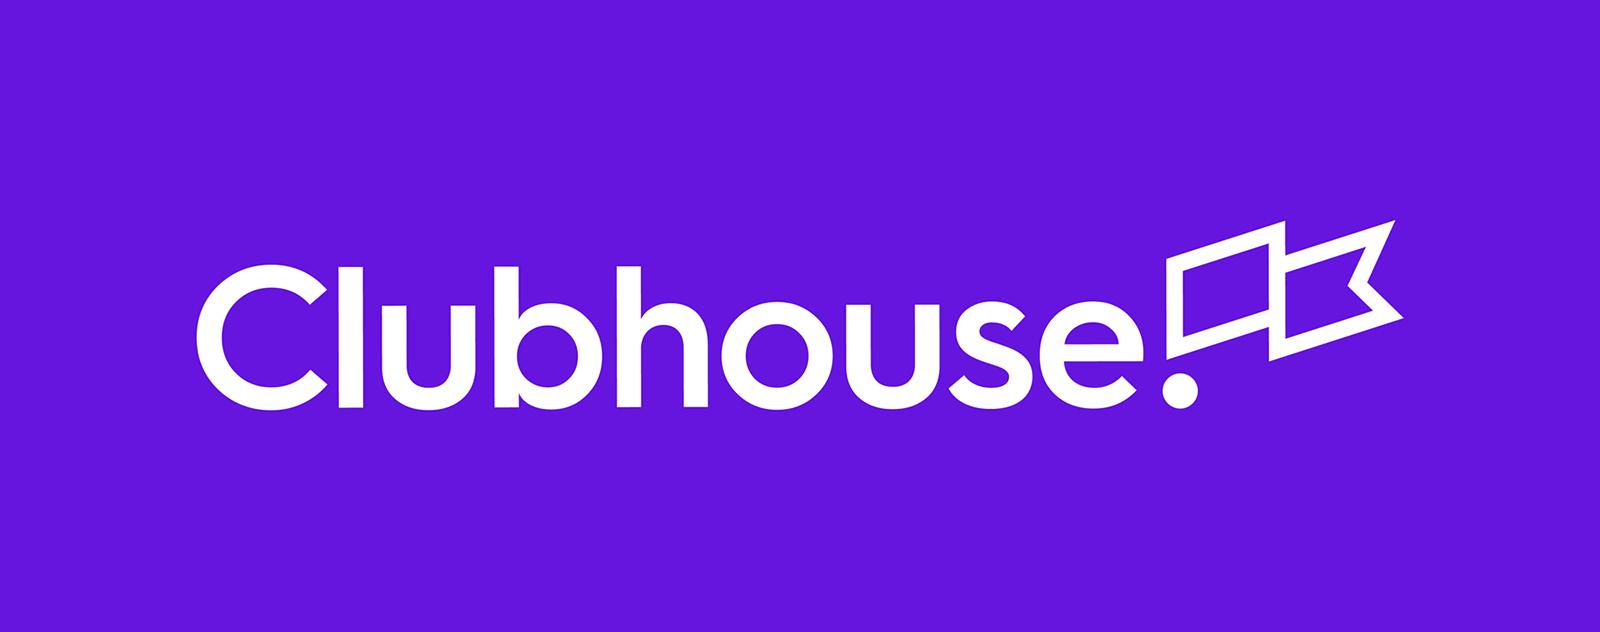 Clubhouse 品牌启用新的logo和形象设计-VI设计2